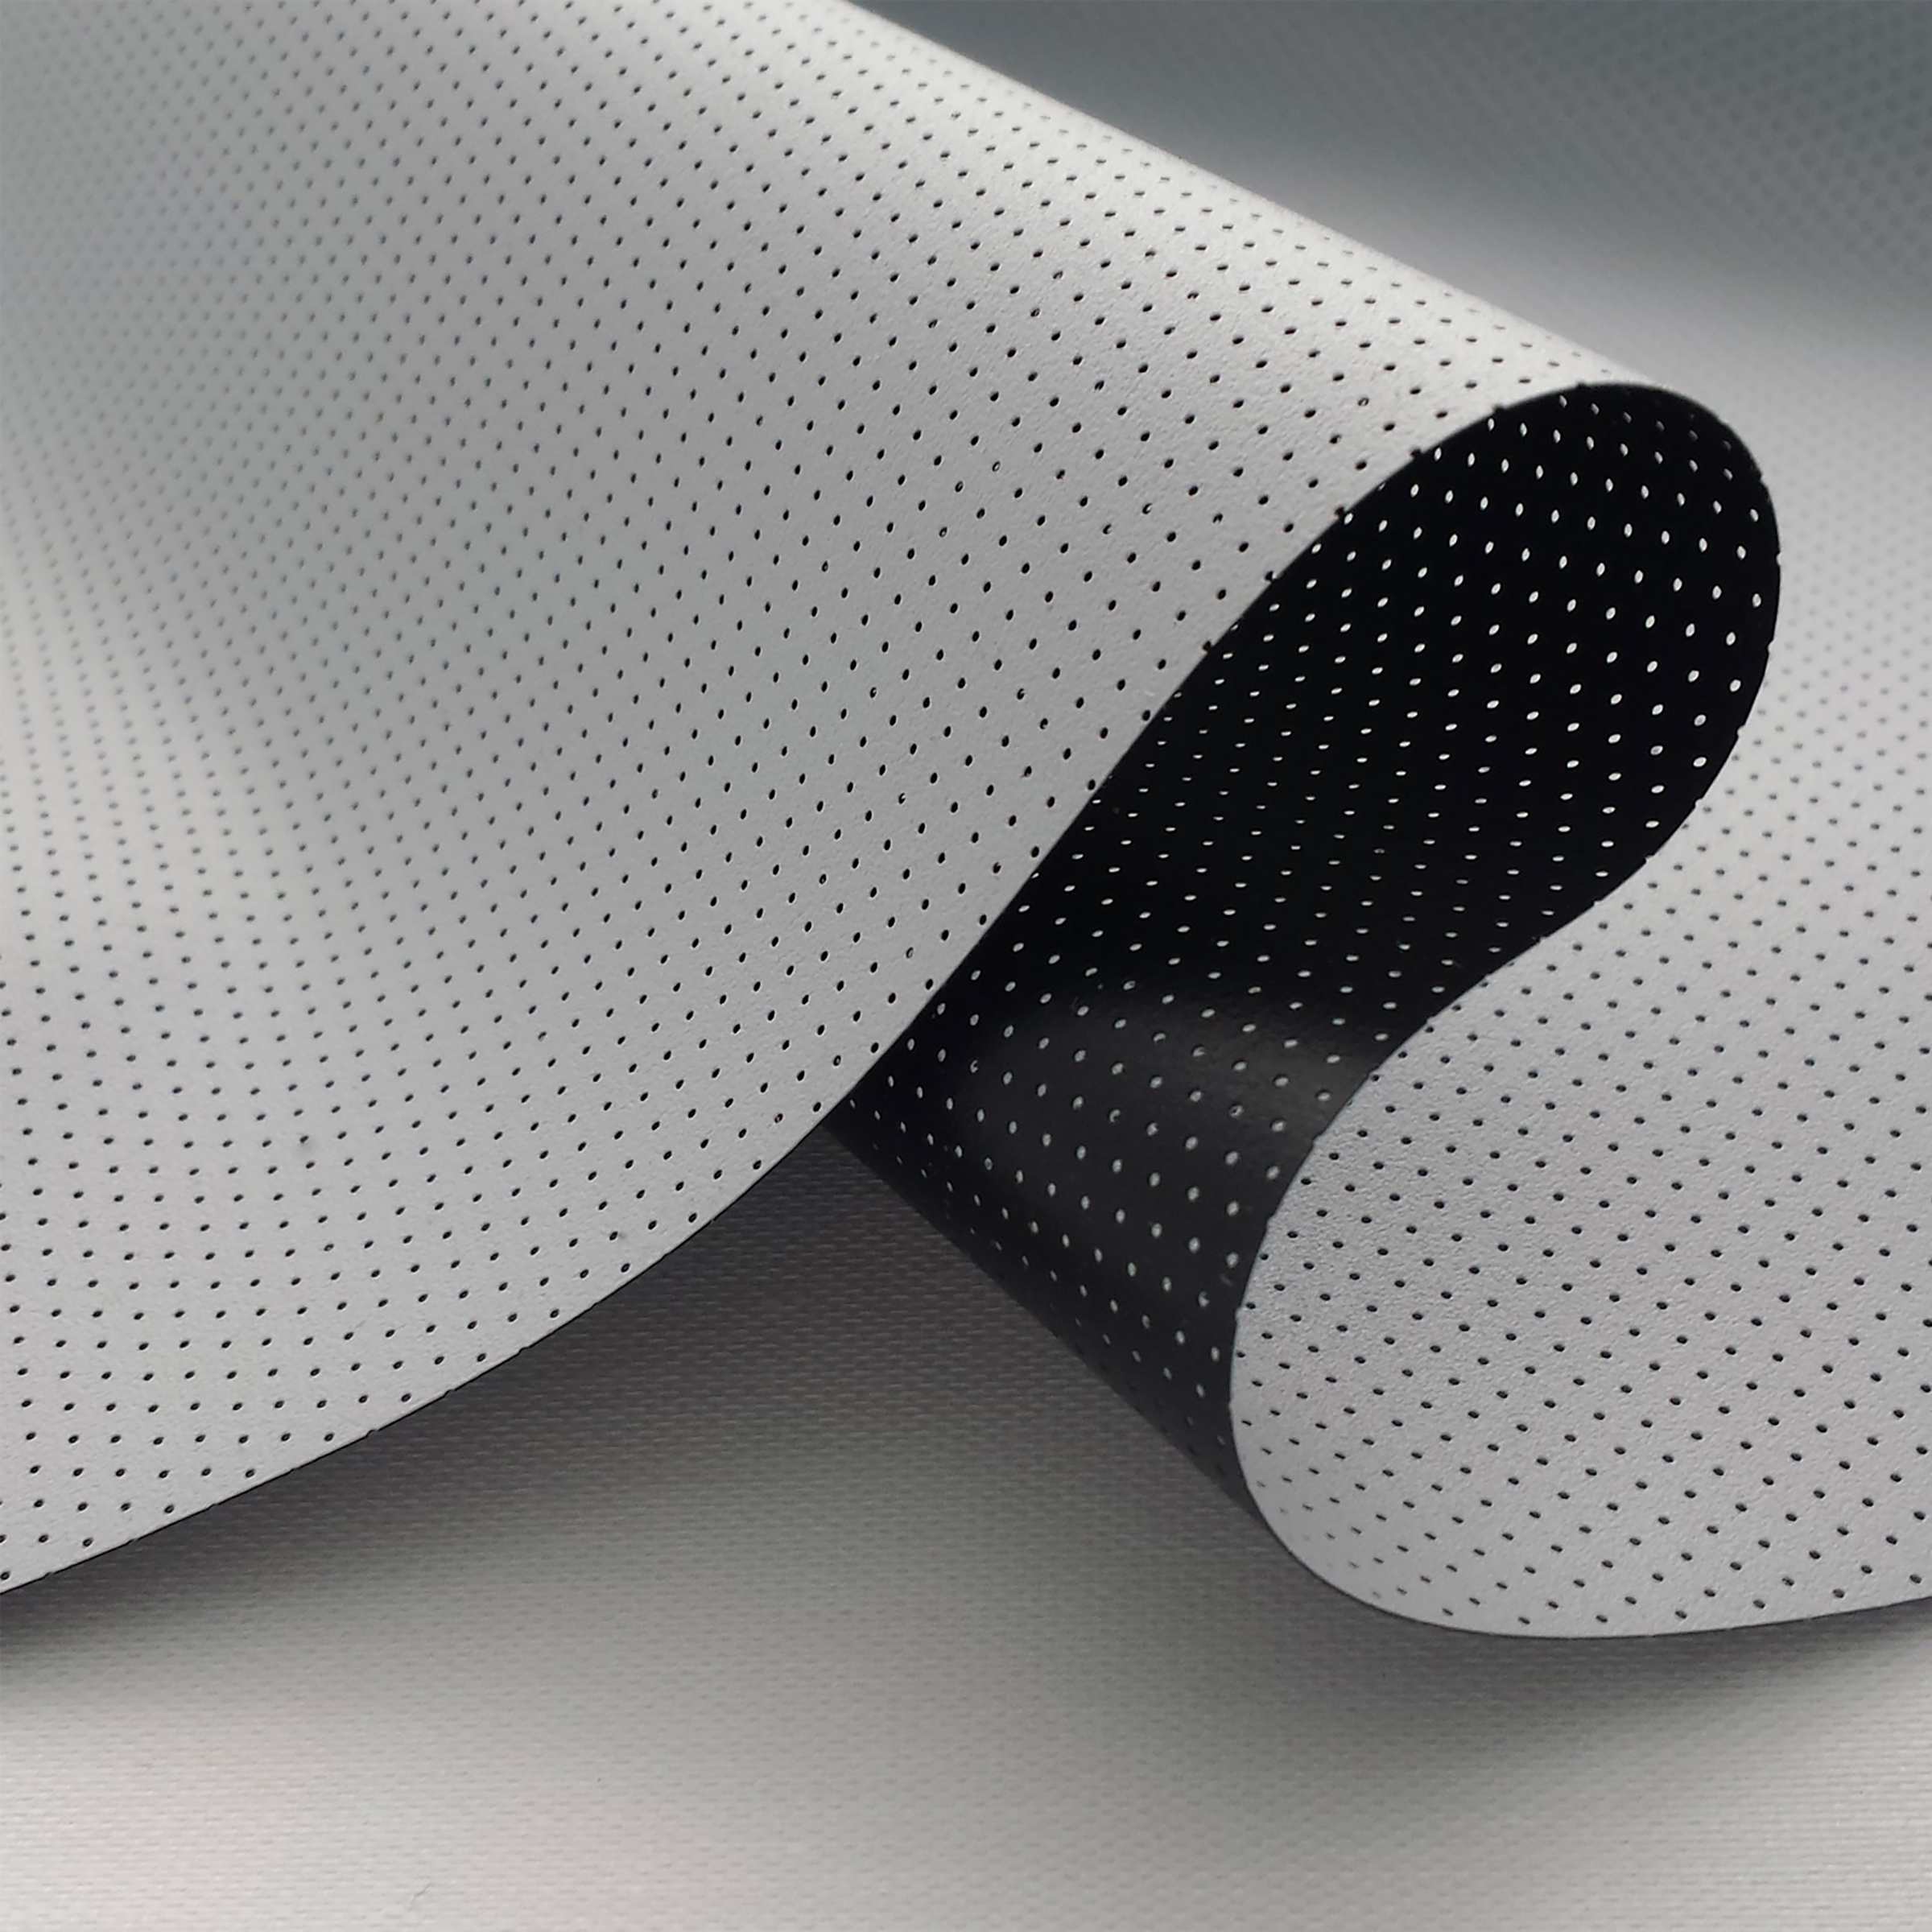 Nano FlexiGray Projector Screen Material